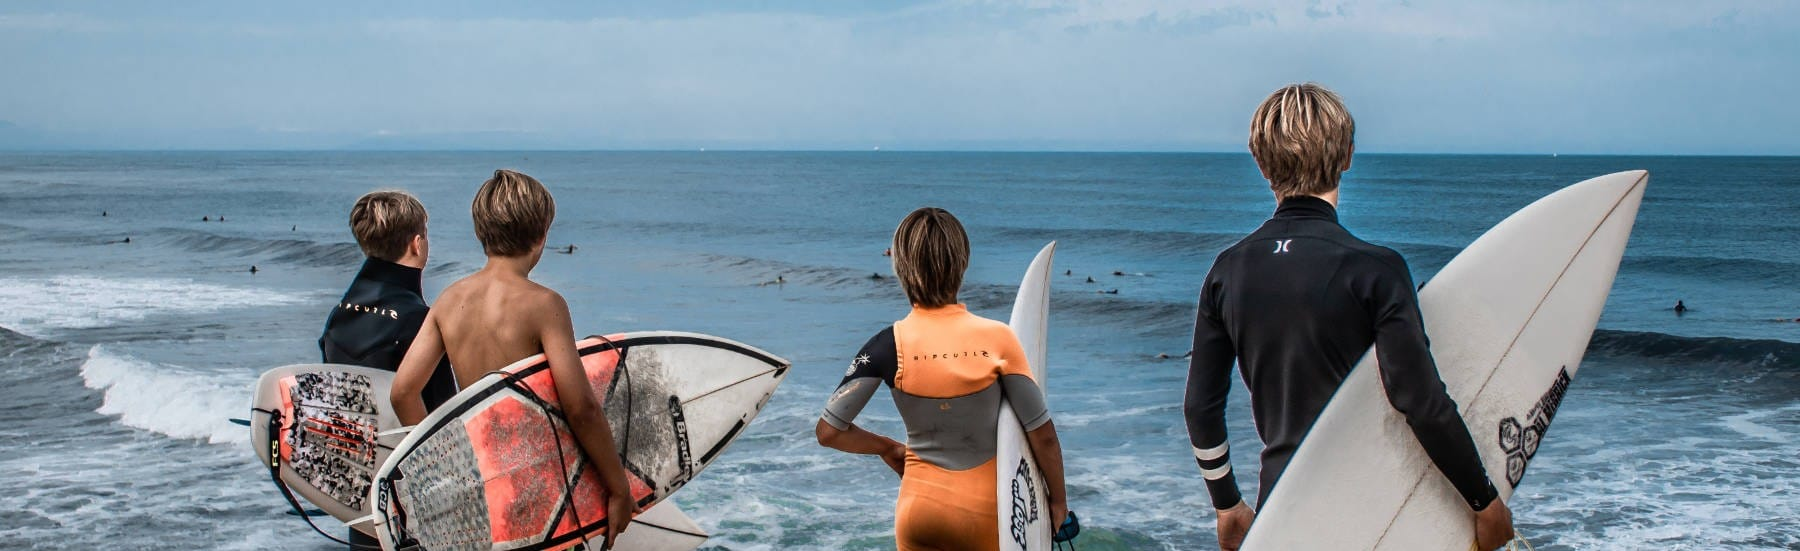 Santocha Surf Club Capbreton